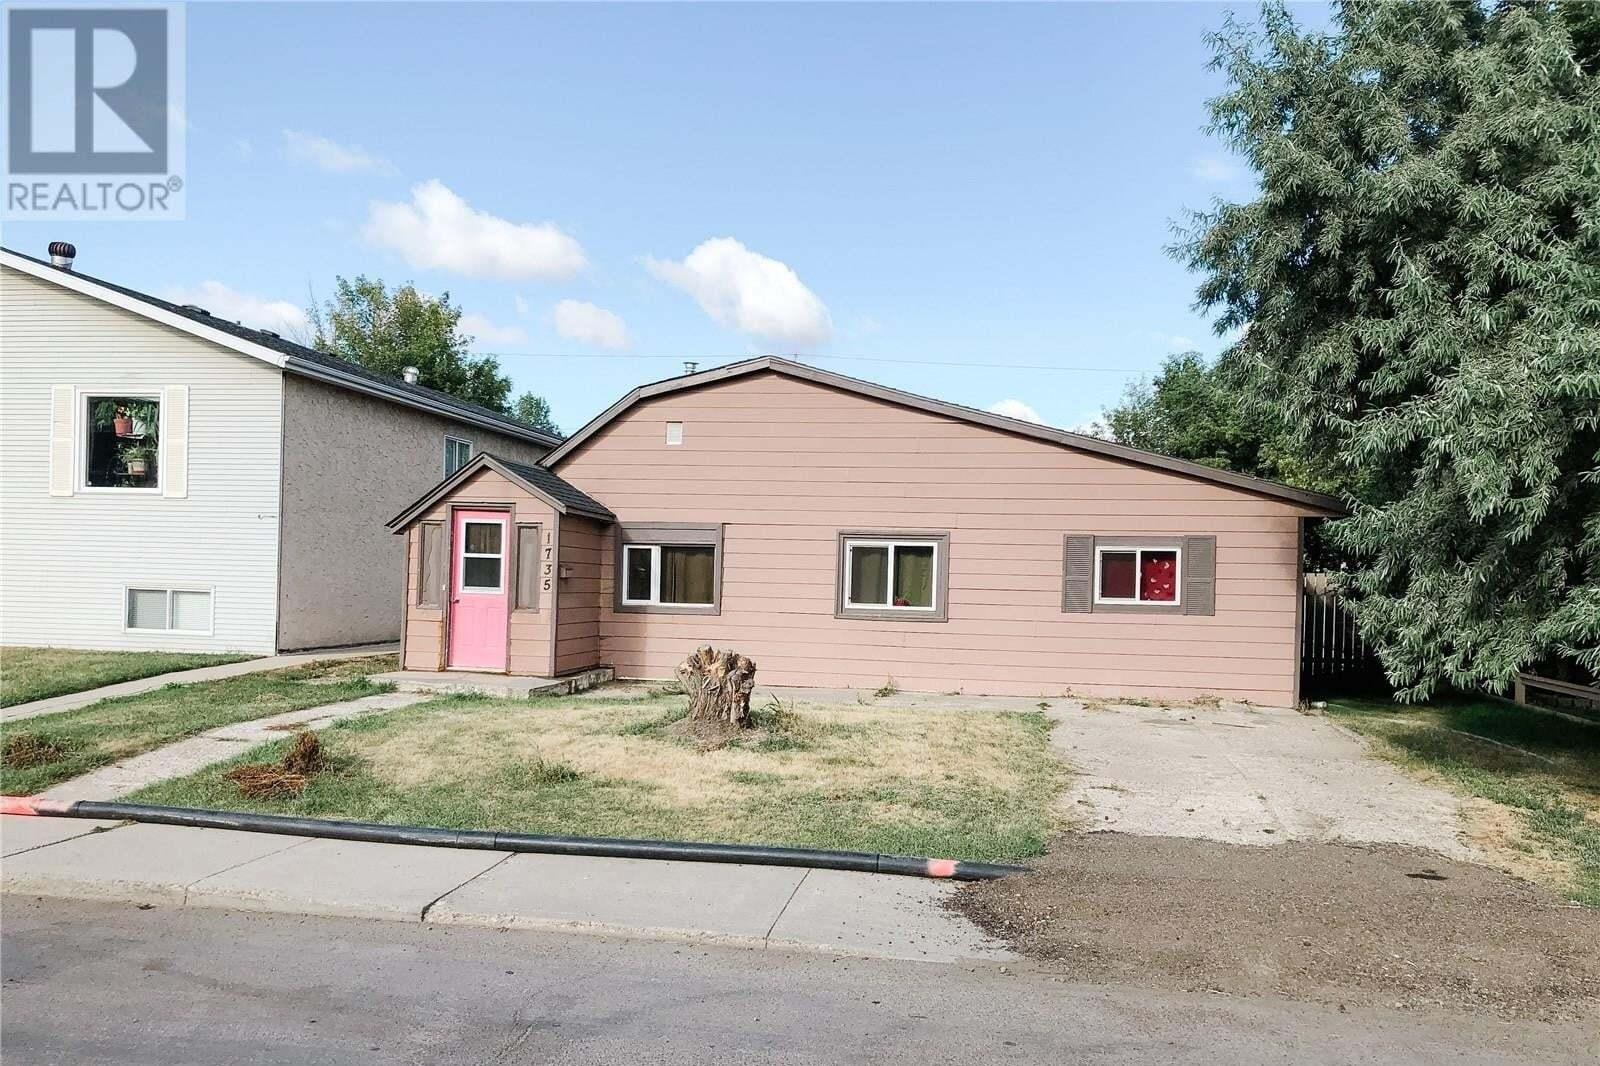 House for sale at 1735 B Ave N Saskatoon Saskatchewan - MLS: SK824458